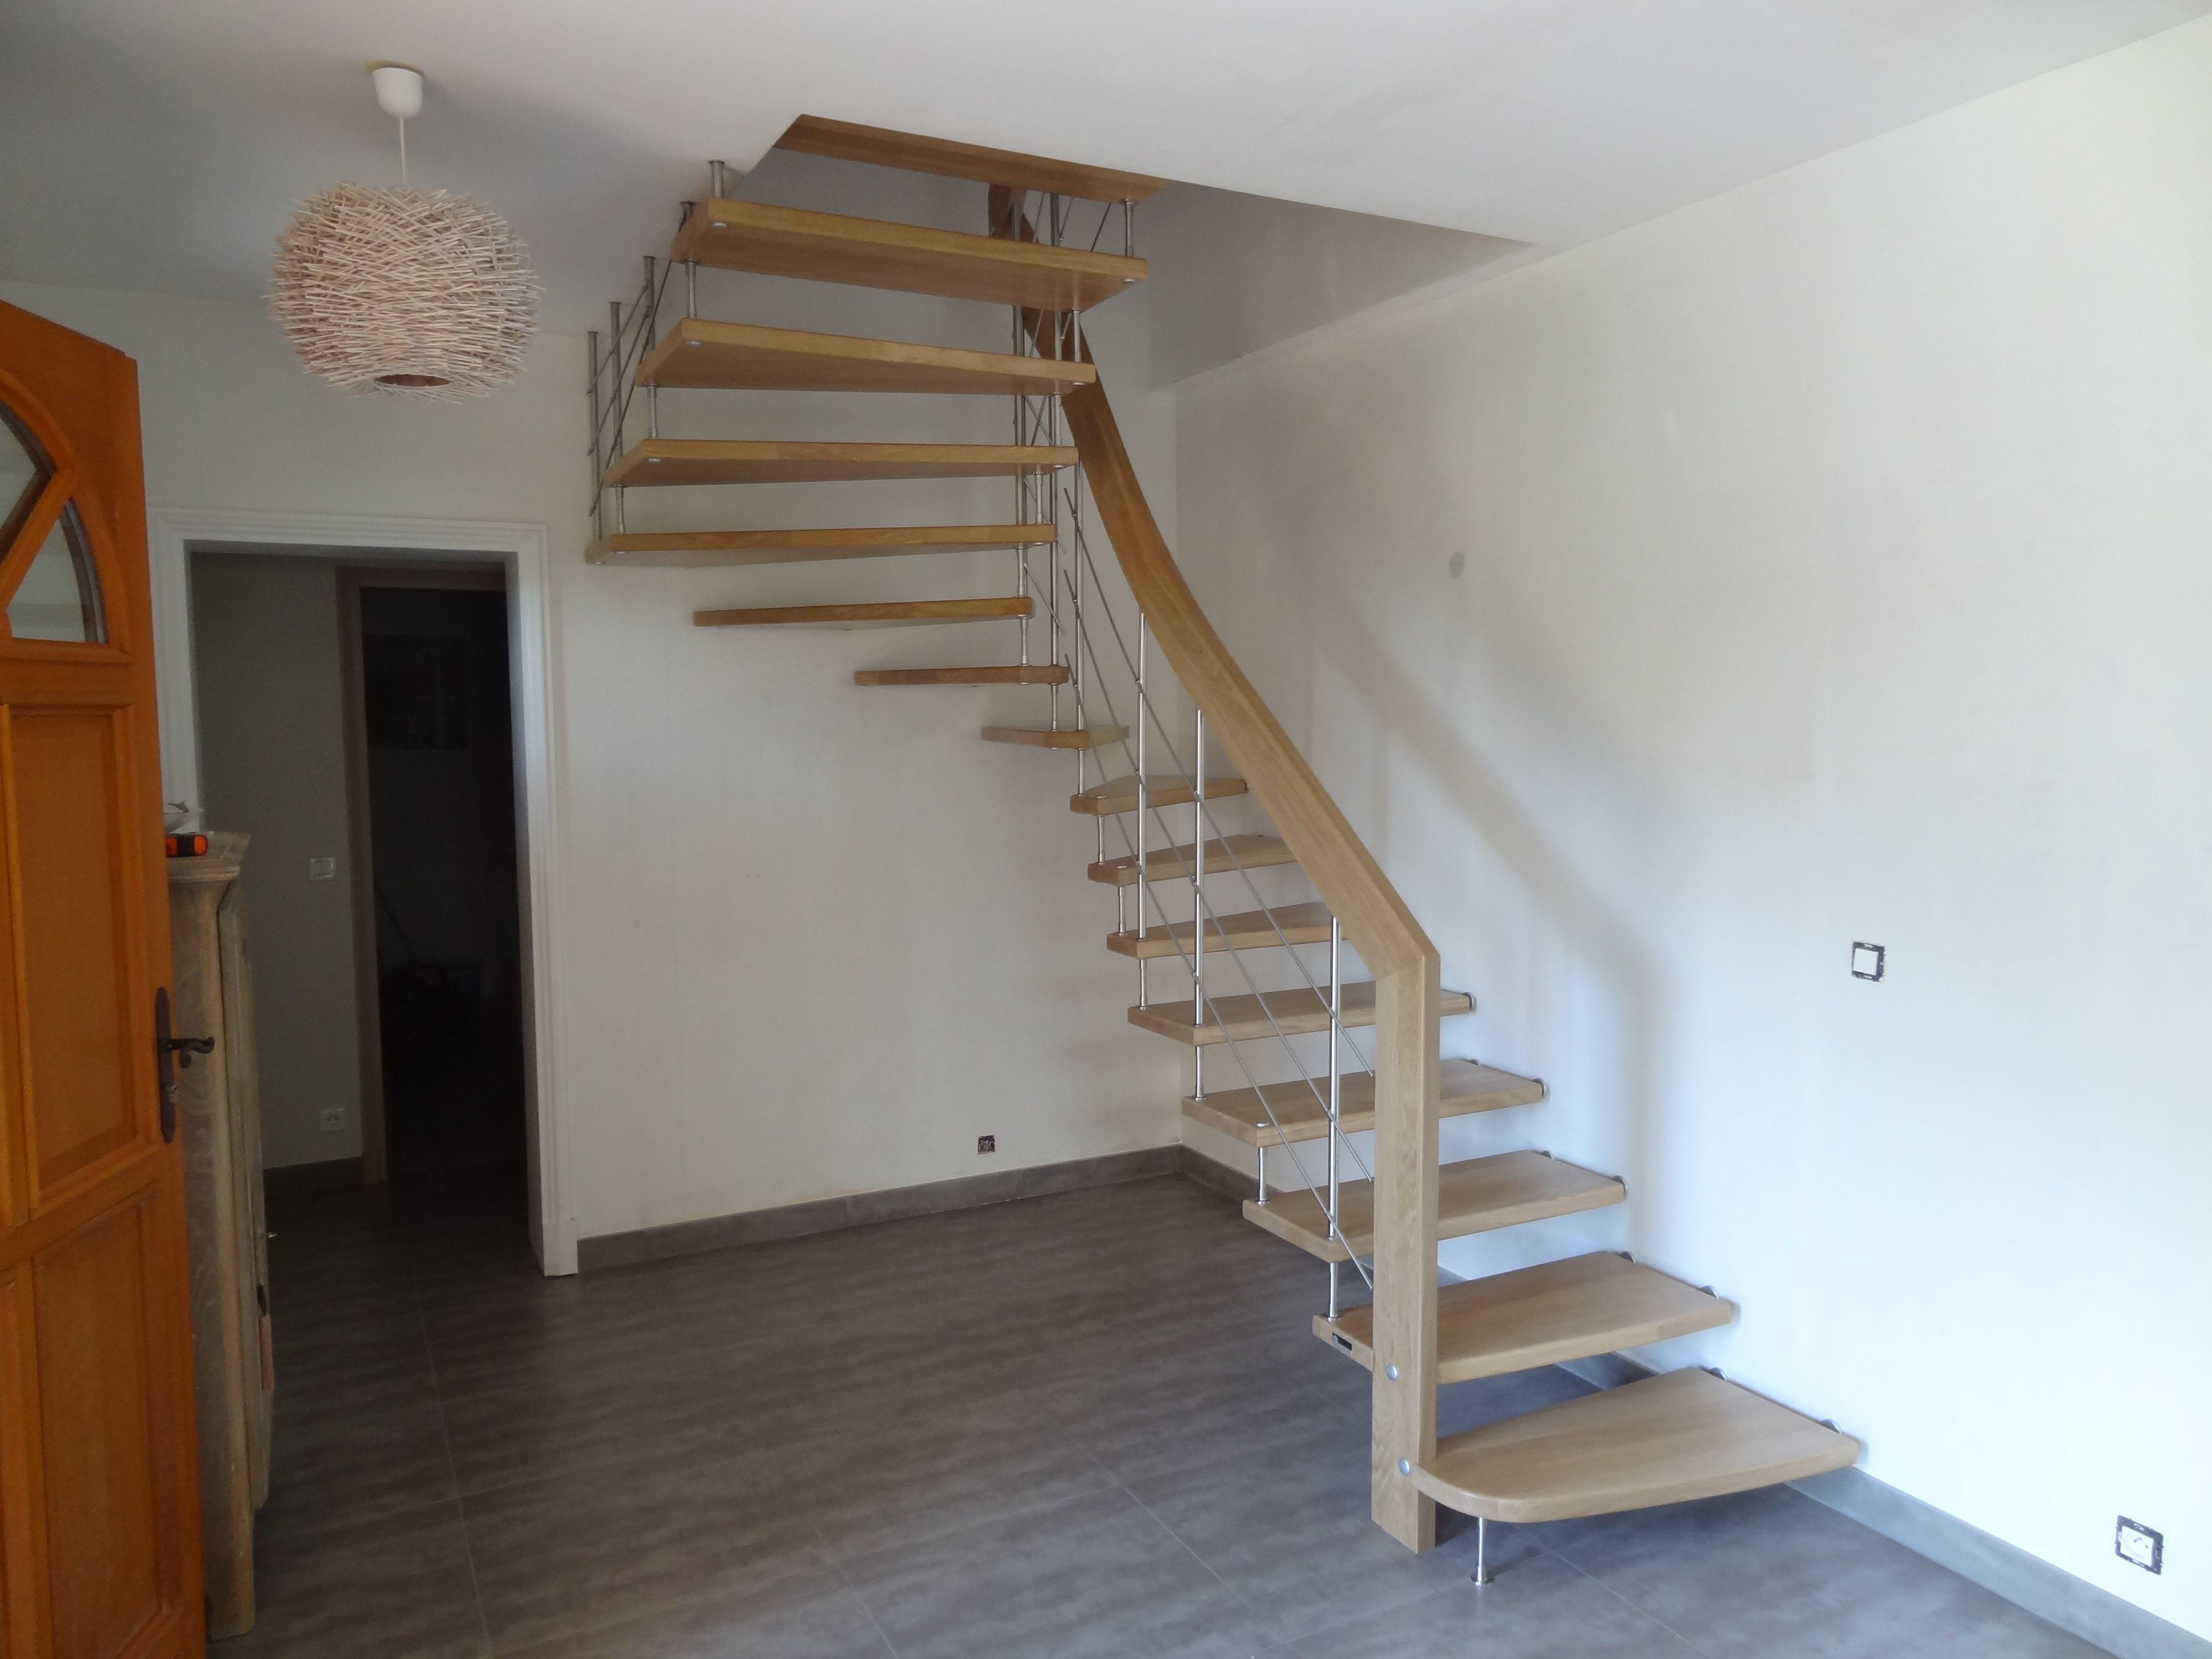 escalier suspendu marche de ch ne massif escalier. Black Bedroom Furniture Sets. Home Design Ideas